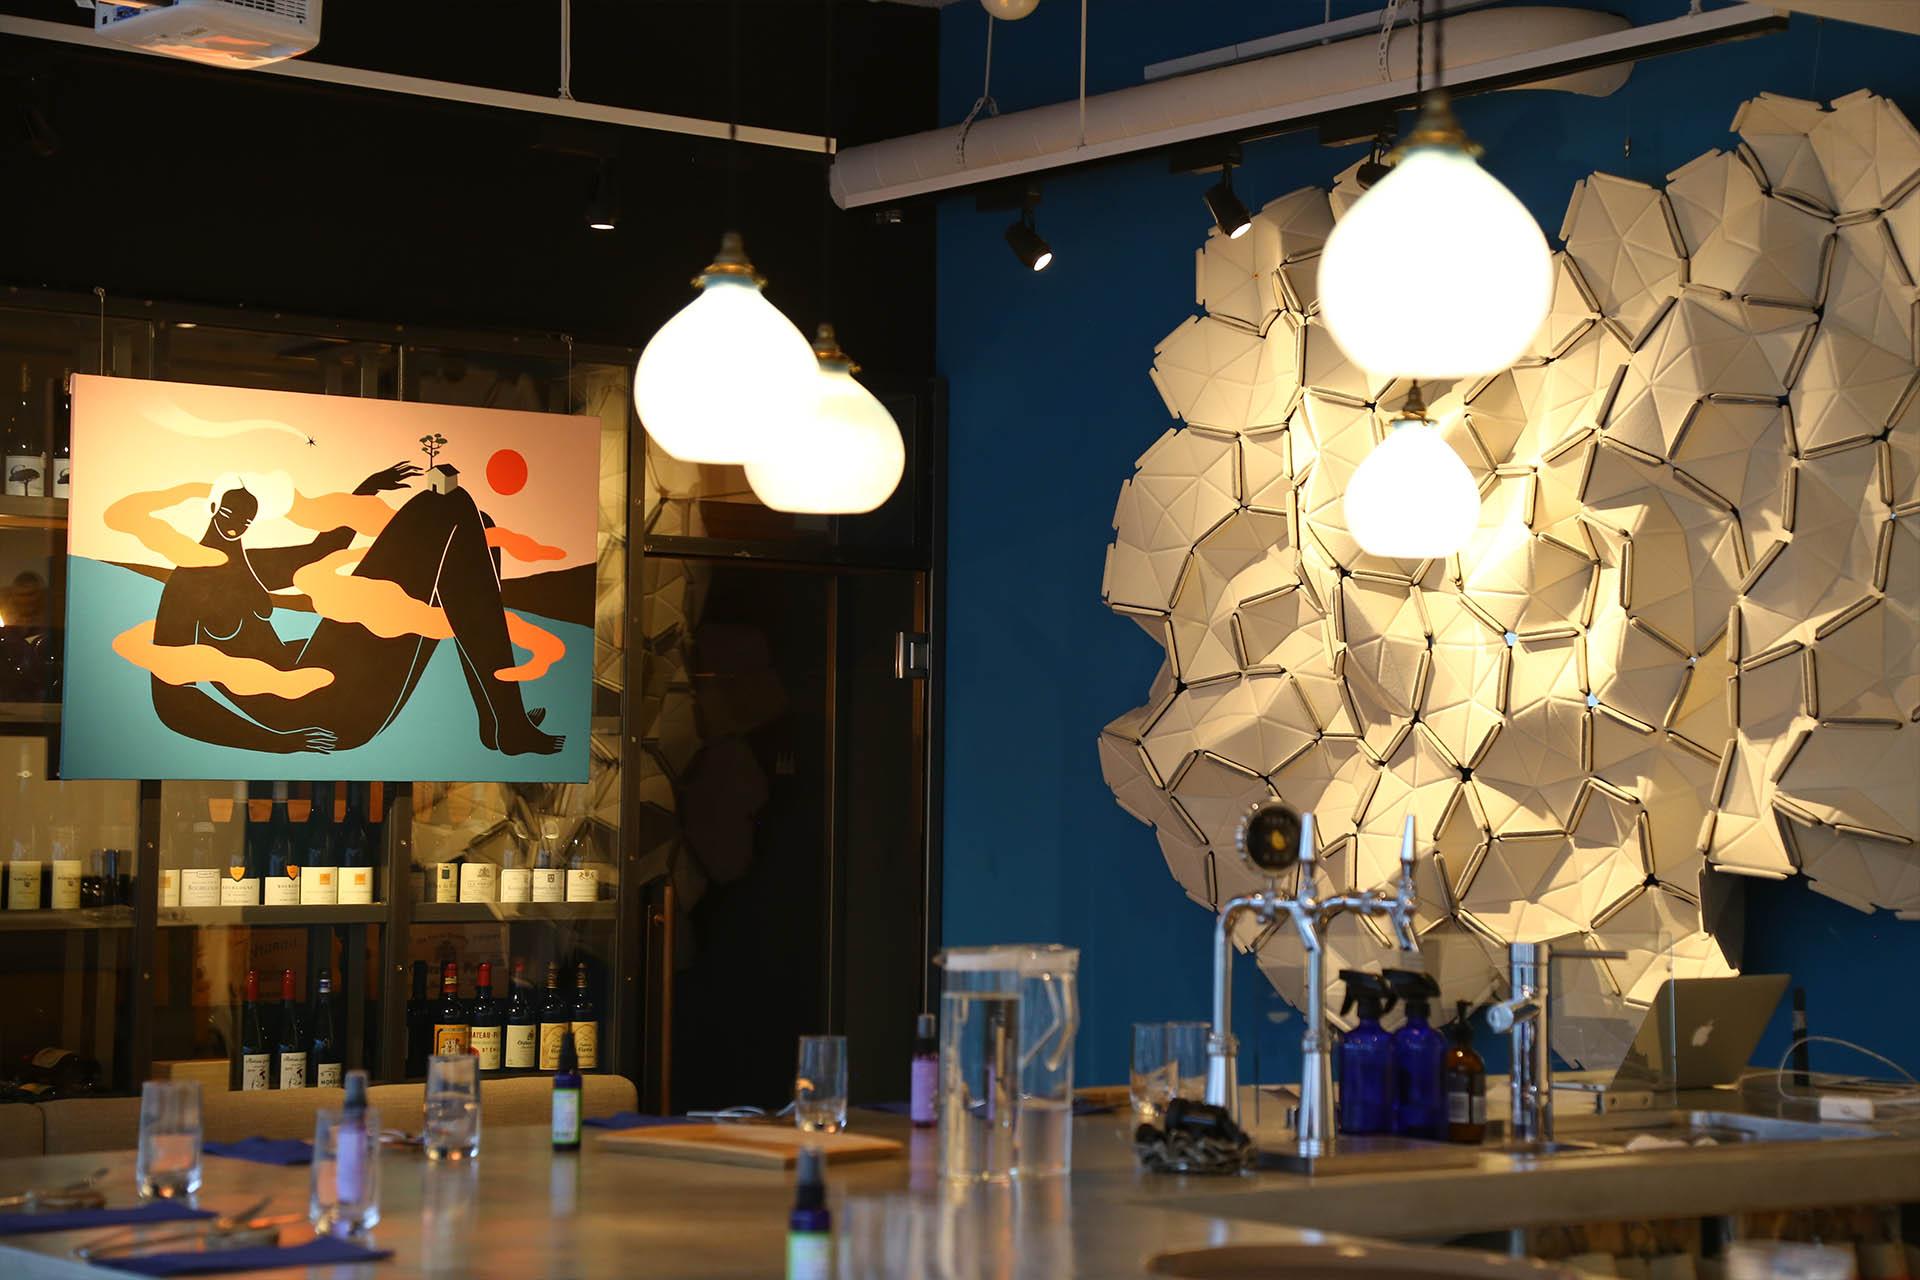 Hilda Palafox exhibition at apéro- アペロ ワインバー / オーガニックワインxフランス家庭料理 - 東京都港区南青山3-4-6 / apéro WINEBAR - vins et petits plats français - 2016